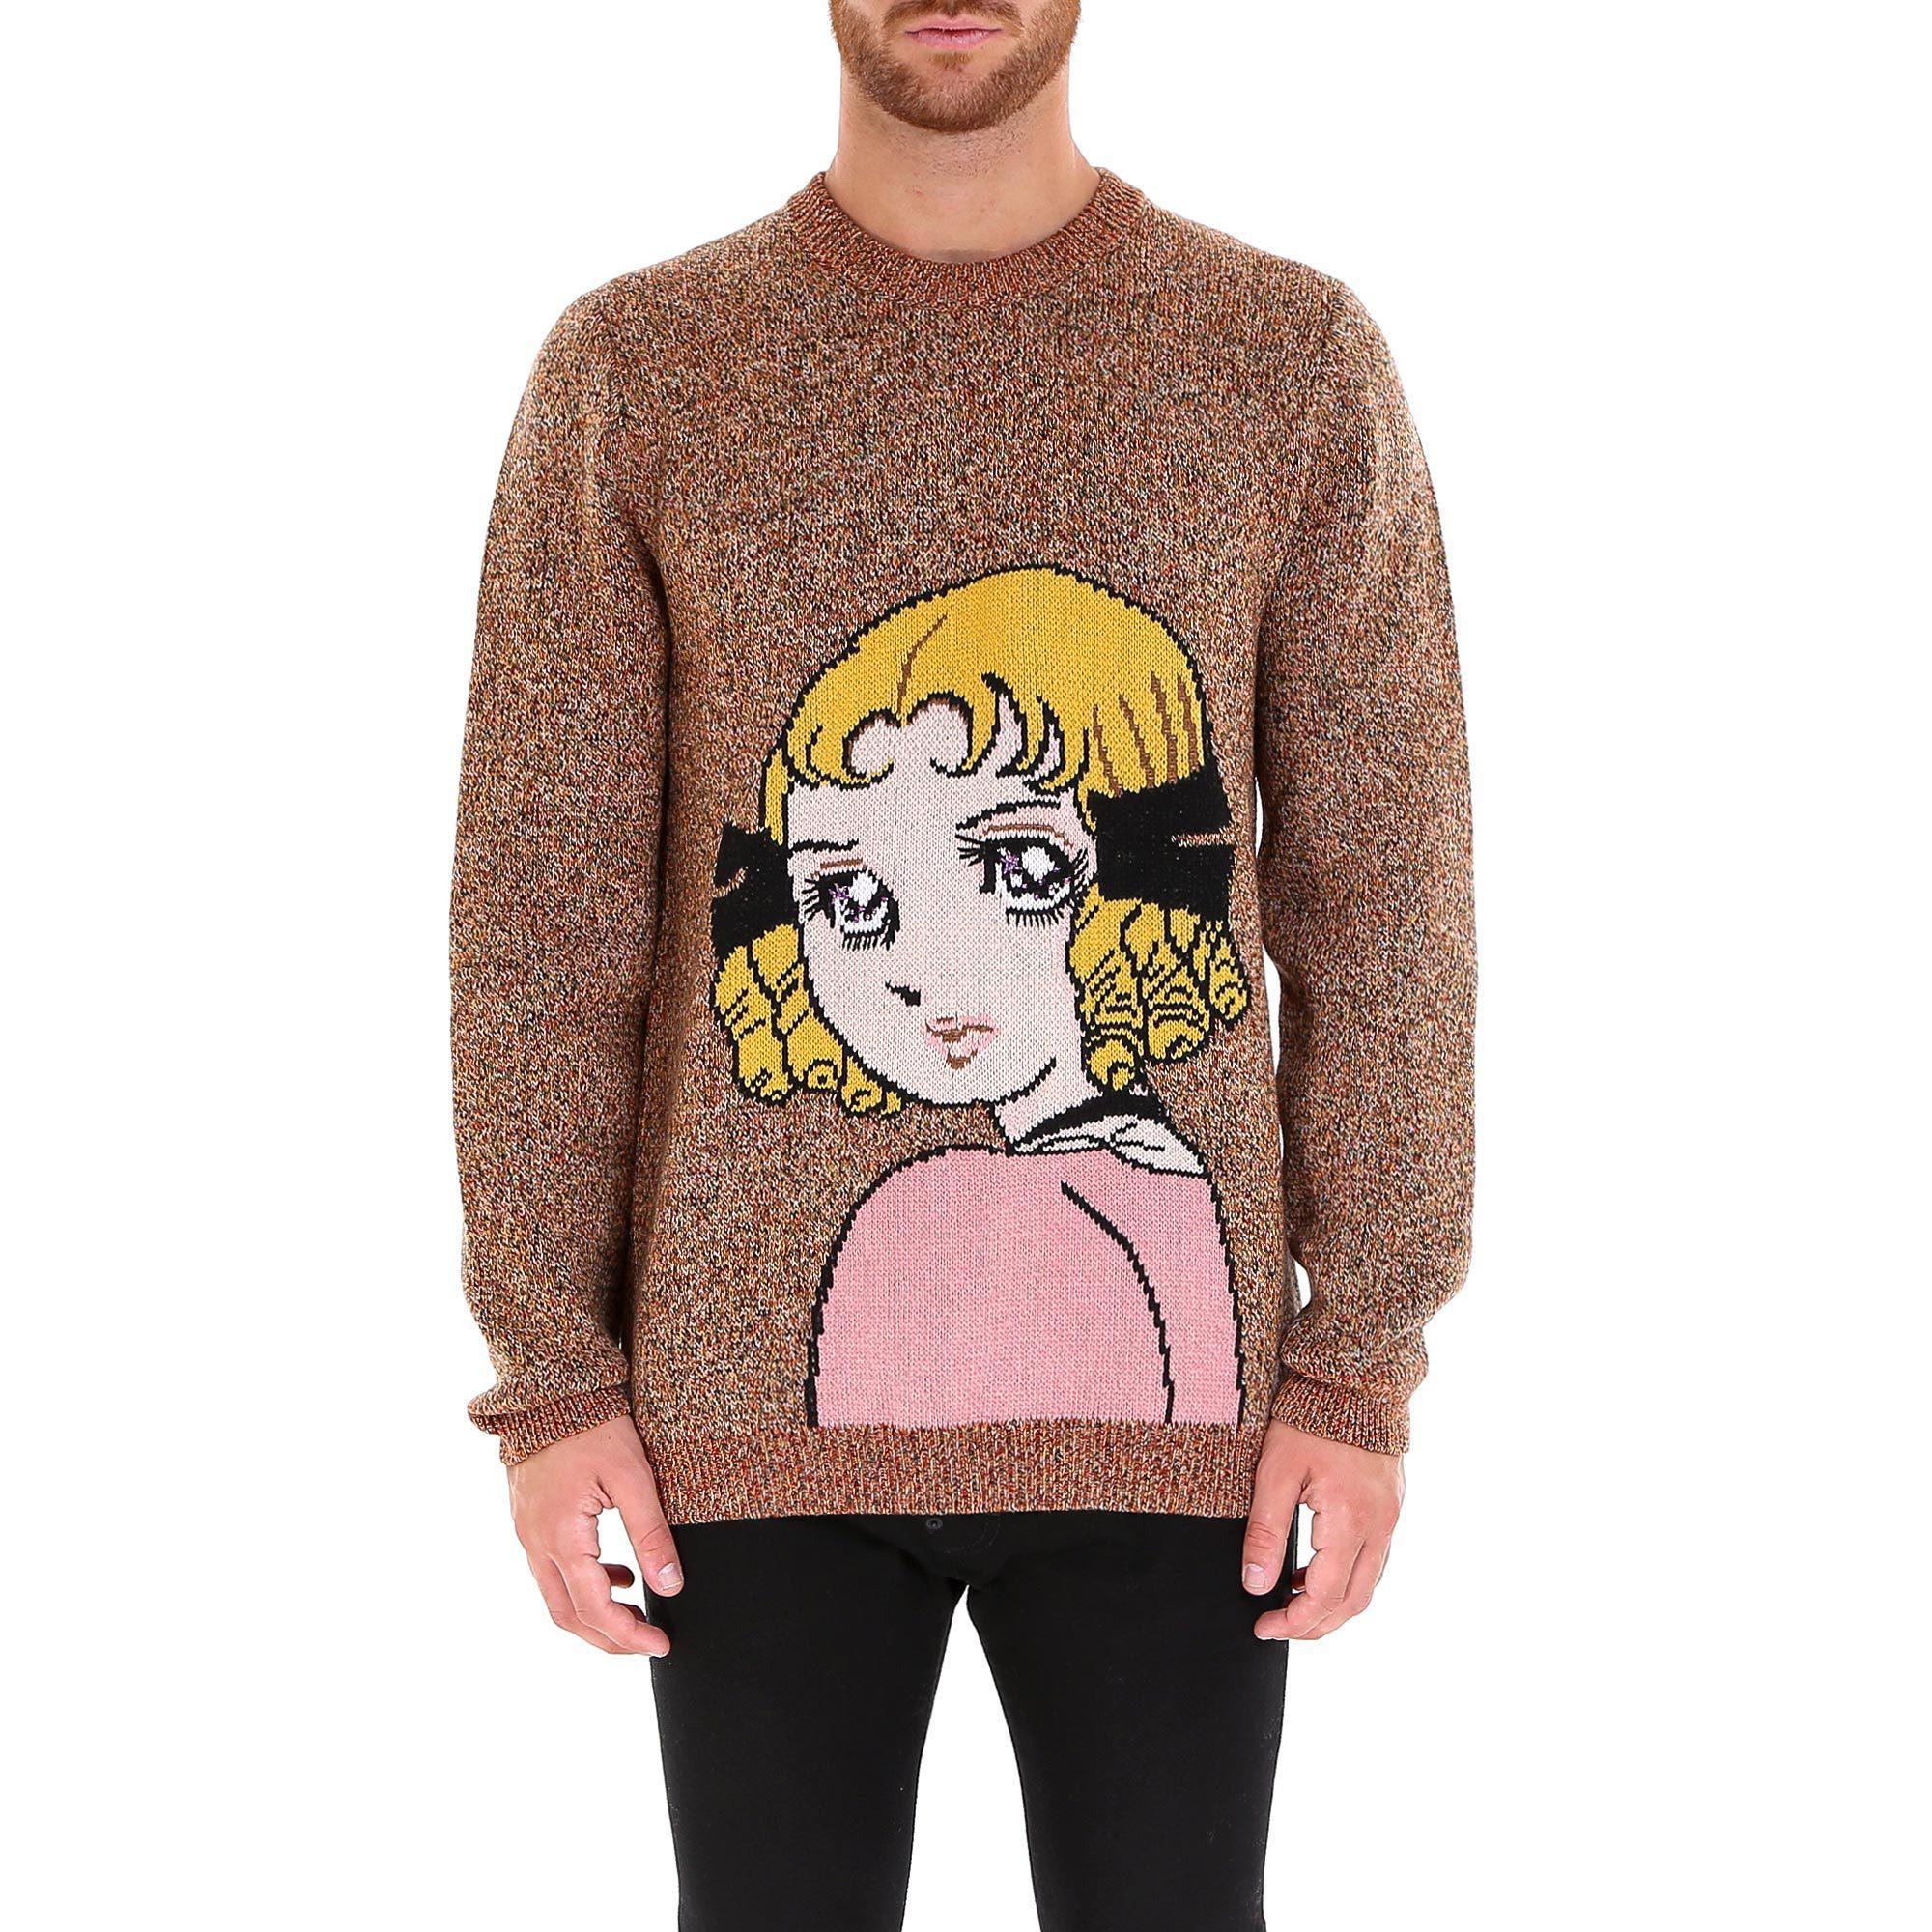 6ec219fde30 Gucci Oversized Intarsia MÉLange Wool Sweater In Brown